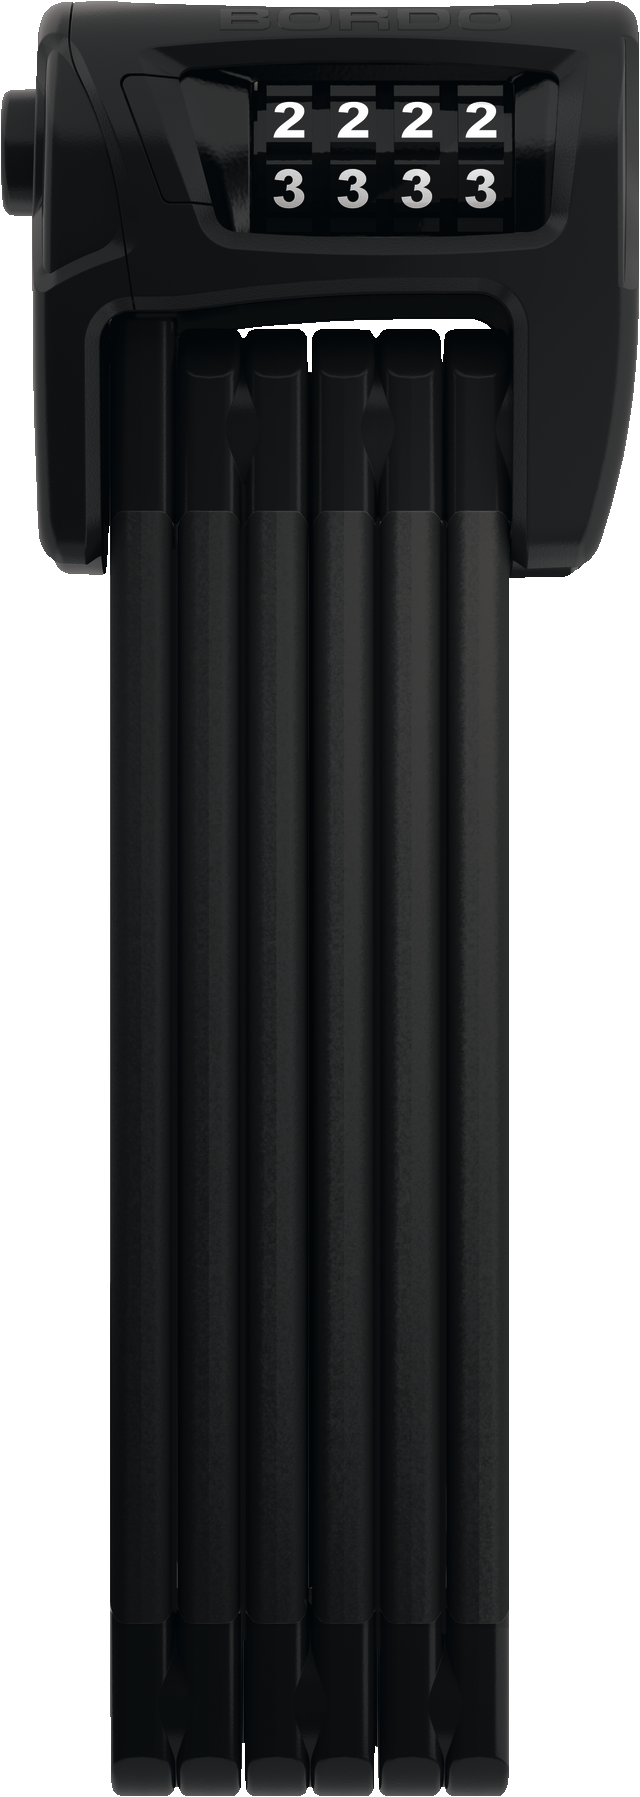 BORDO Combo™ 6100